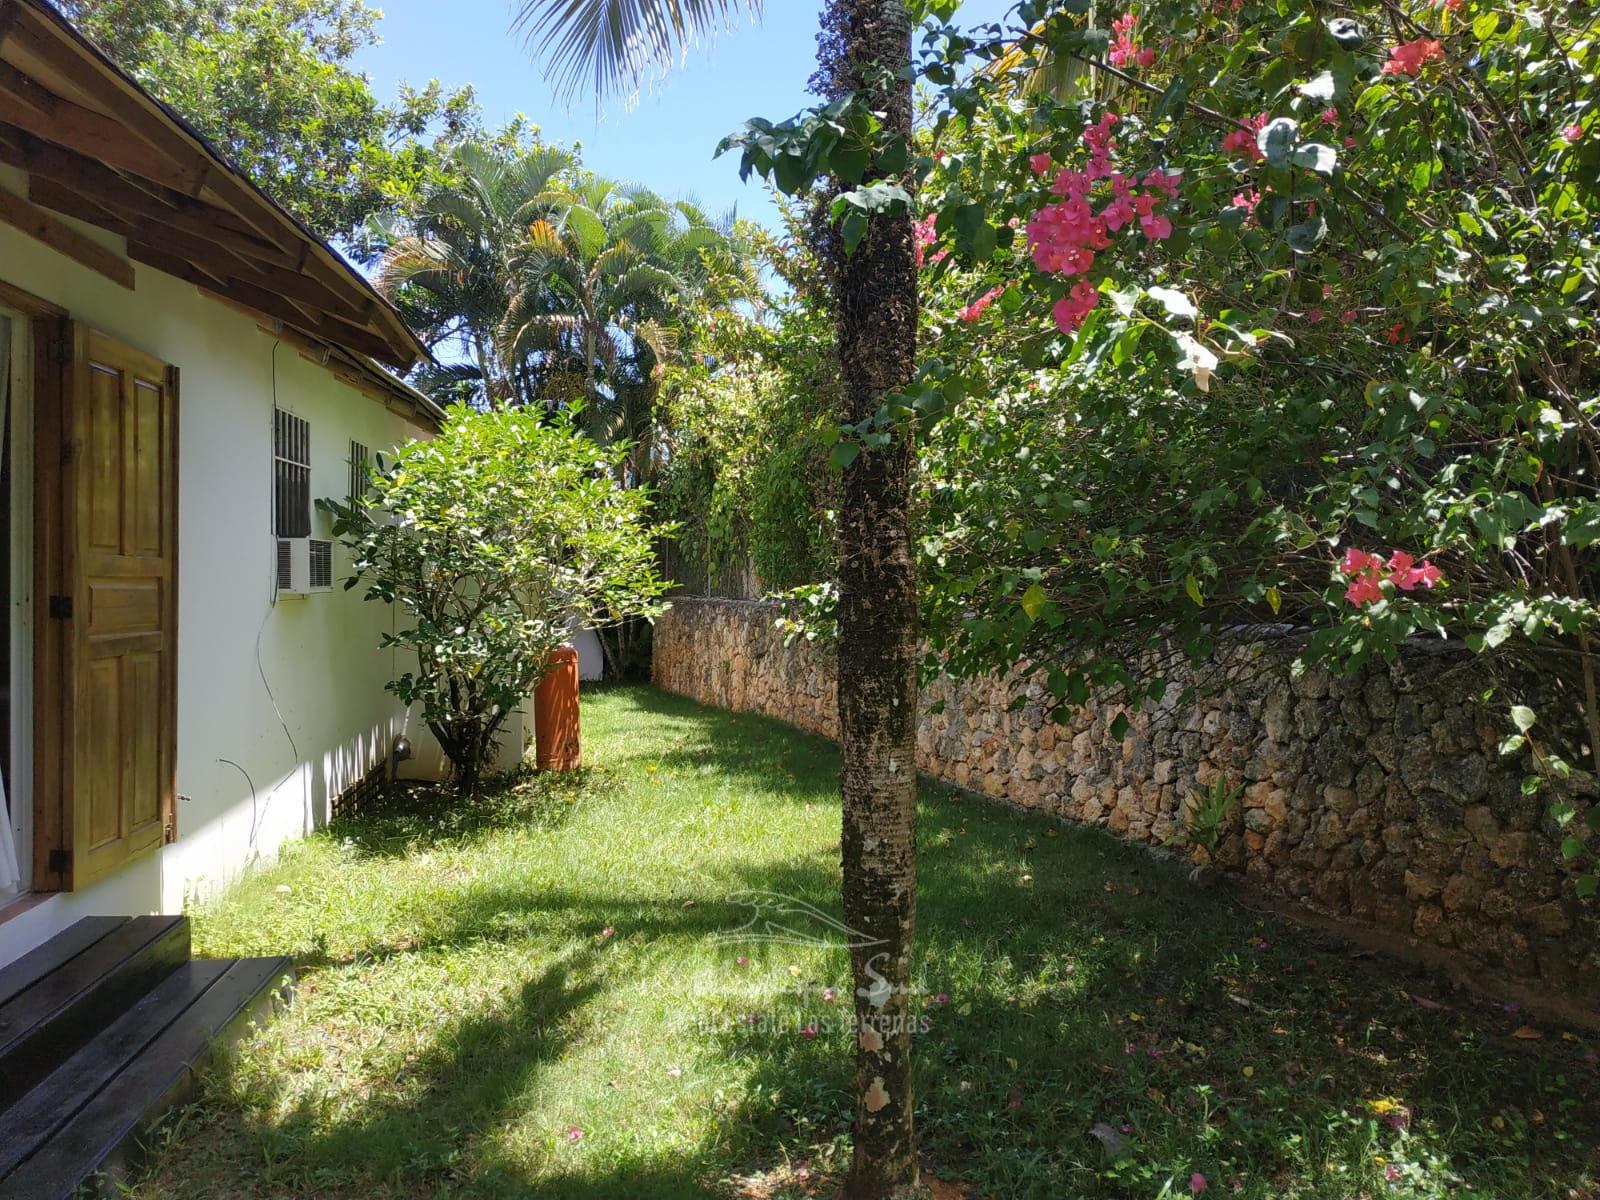 Villa Authentic Carribean Real Estate Las Terrenas Dominican Republic6.jpg